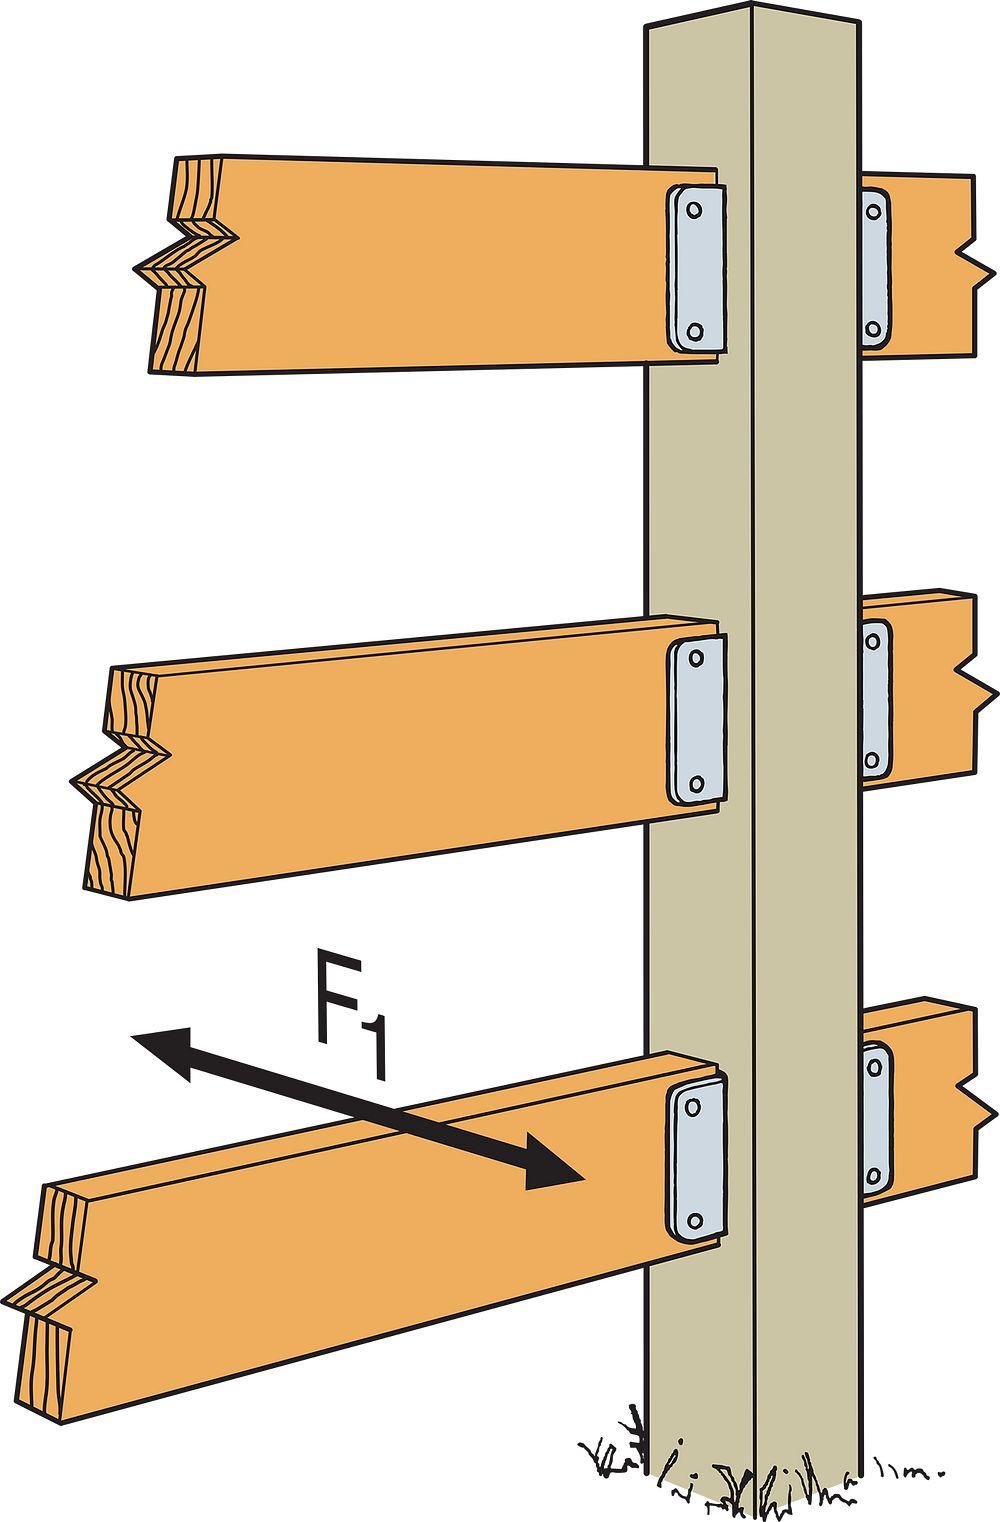 Typical FB26 Fencing Installation